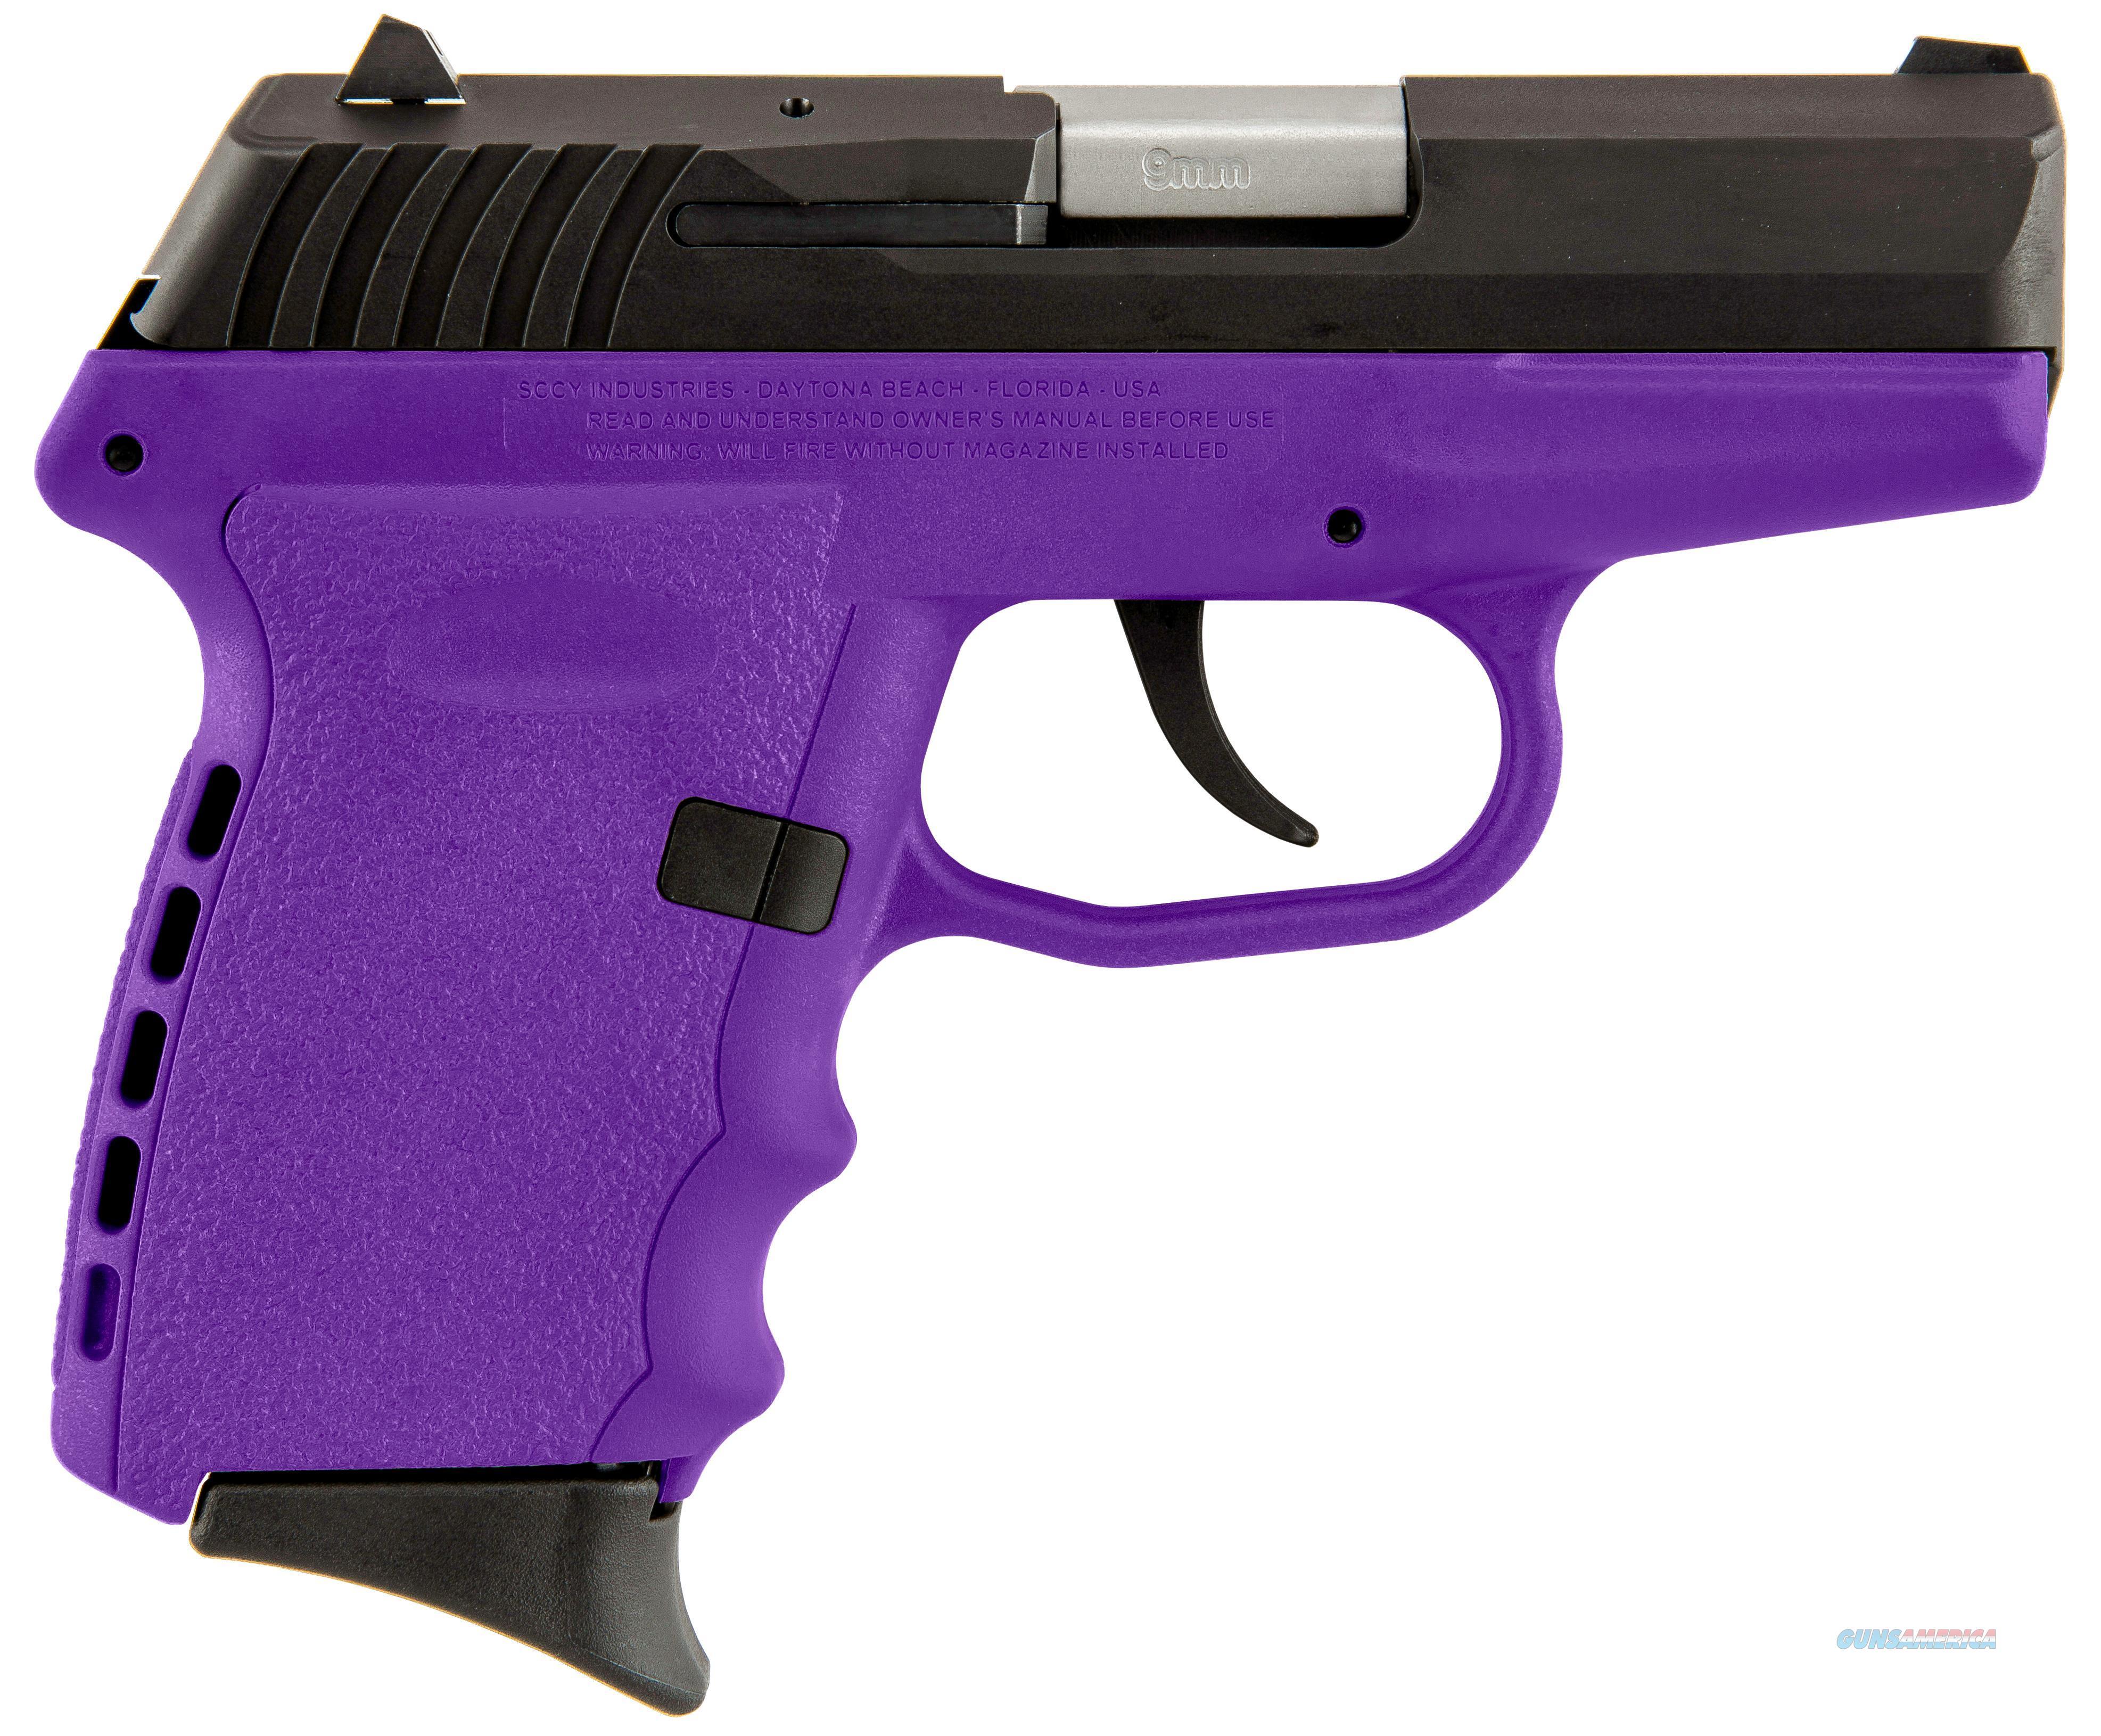 Sccy Industries Cpx2-Cb Pistol Dao 9Mm 10Rd Black/Purple W/O Safety CPX2-CBPU  Guns > Pistols > S Misc Pistols